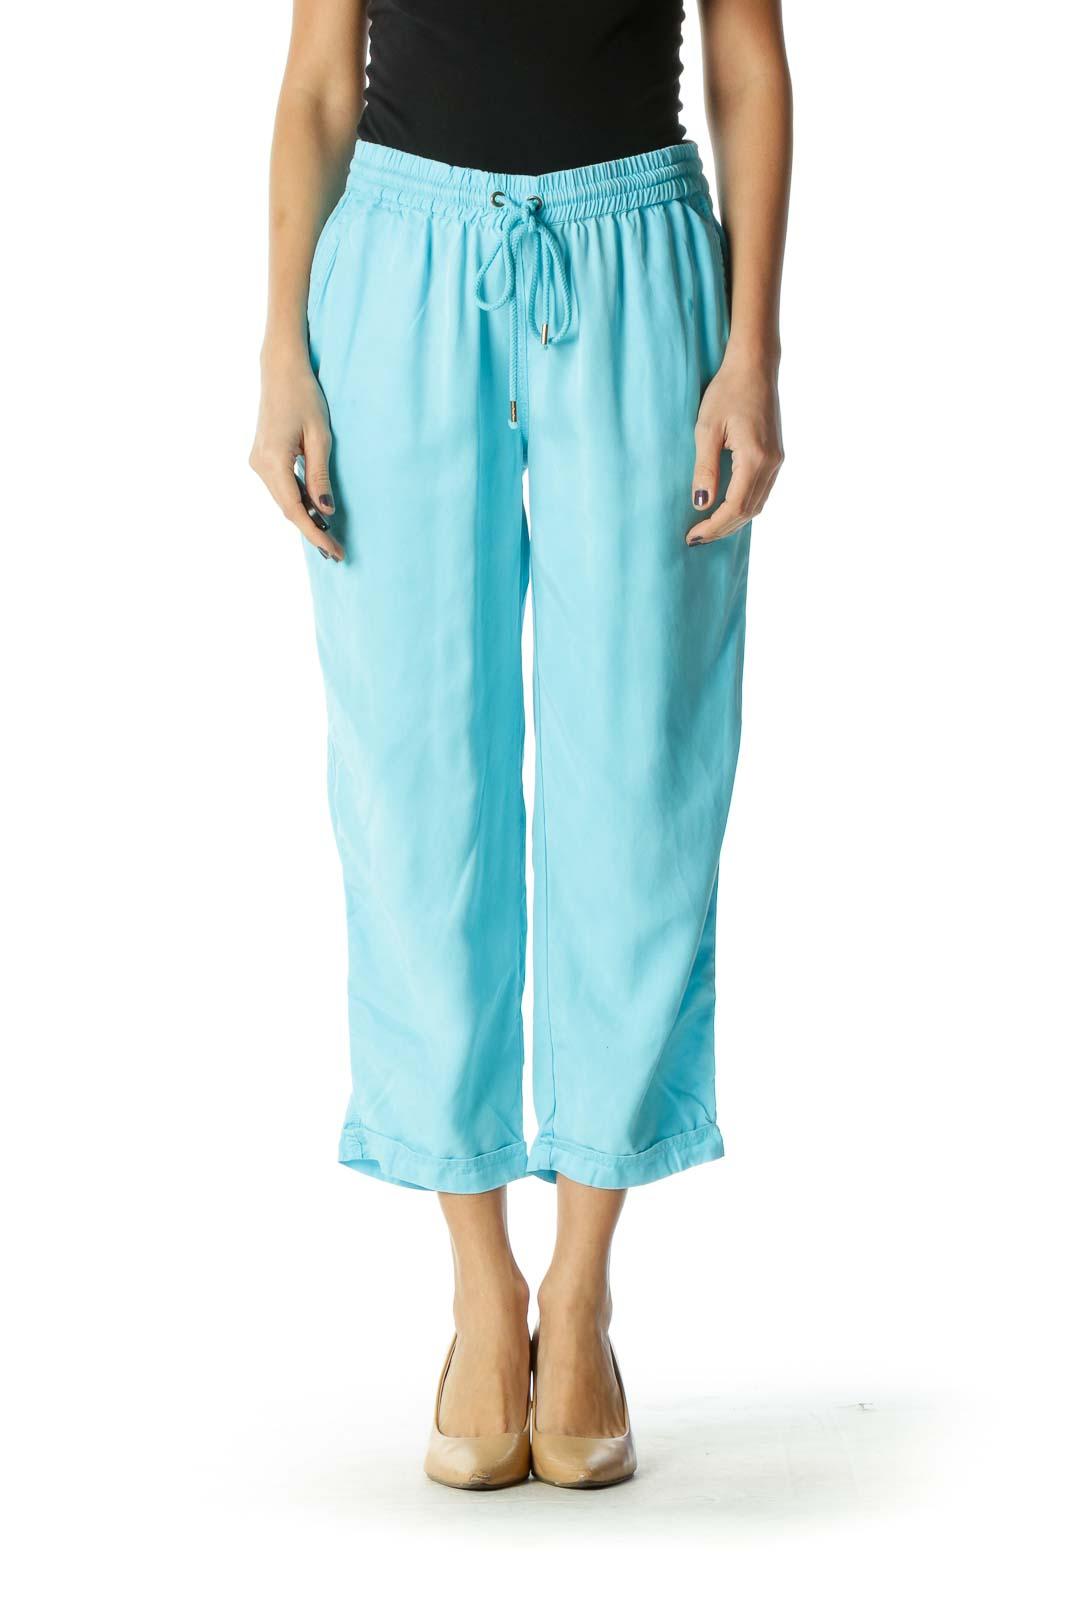 Blue Casual SweatPant Pant Front